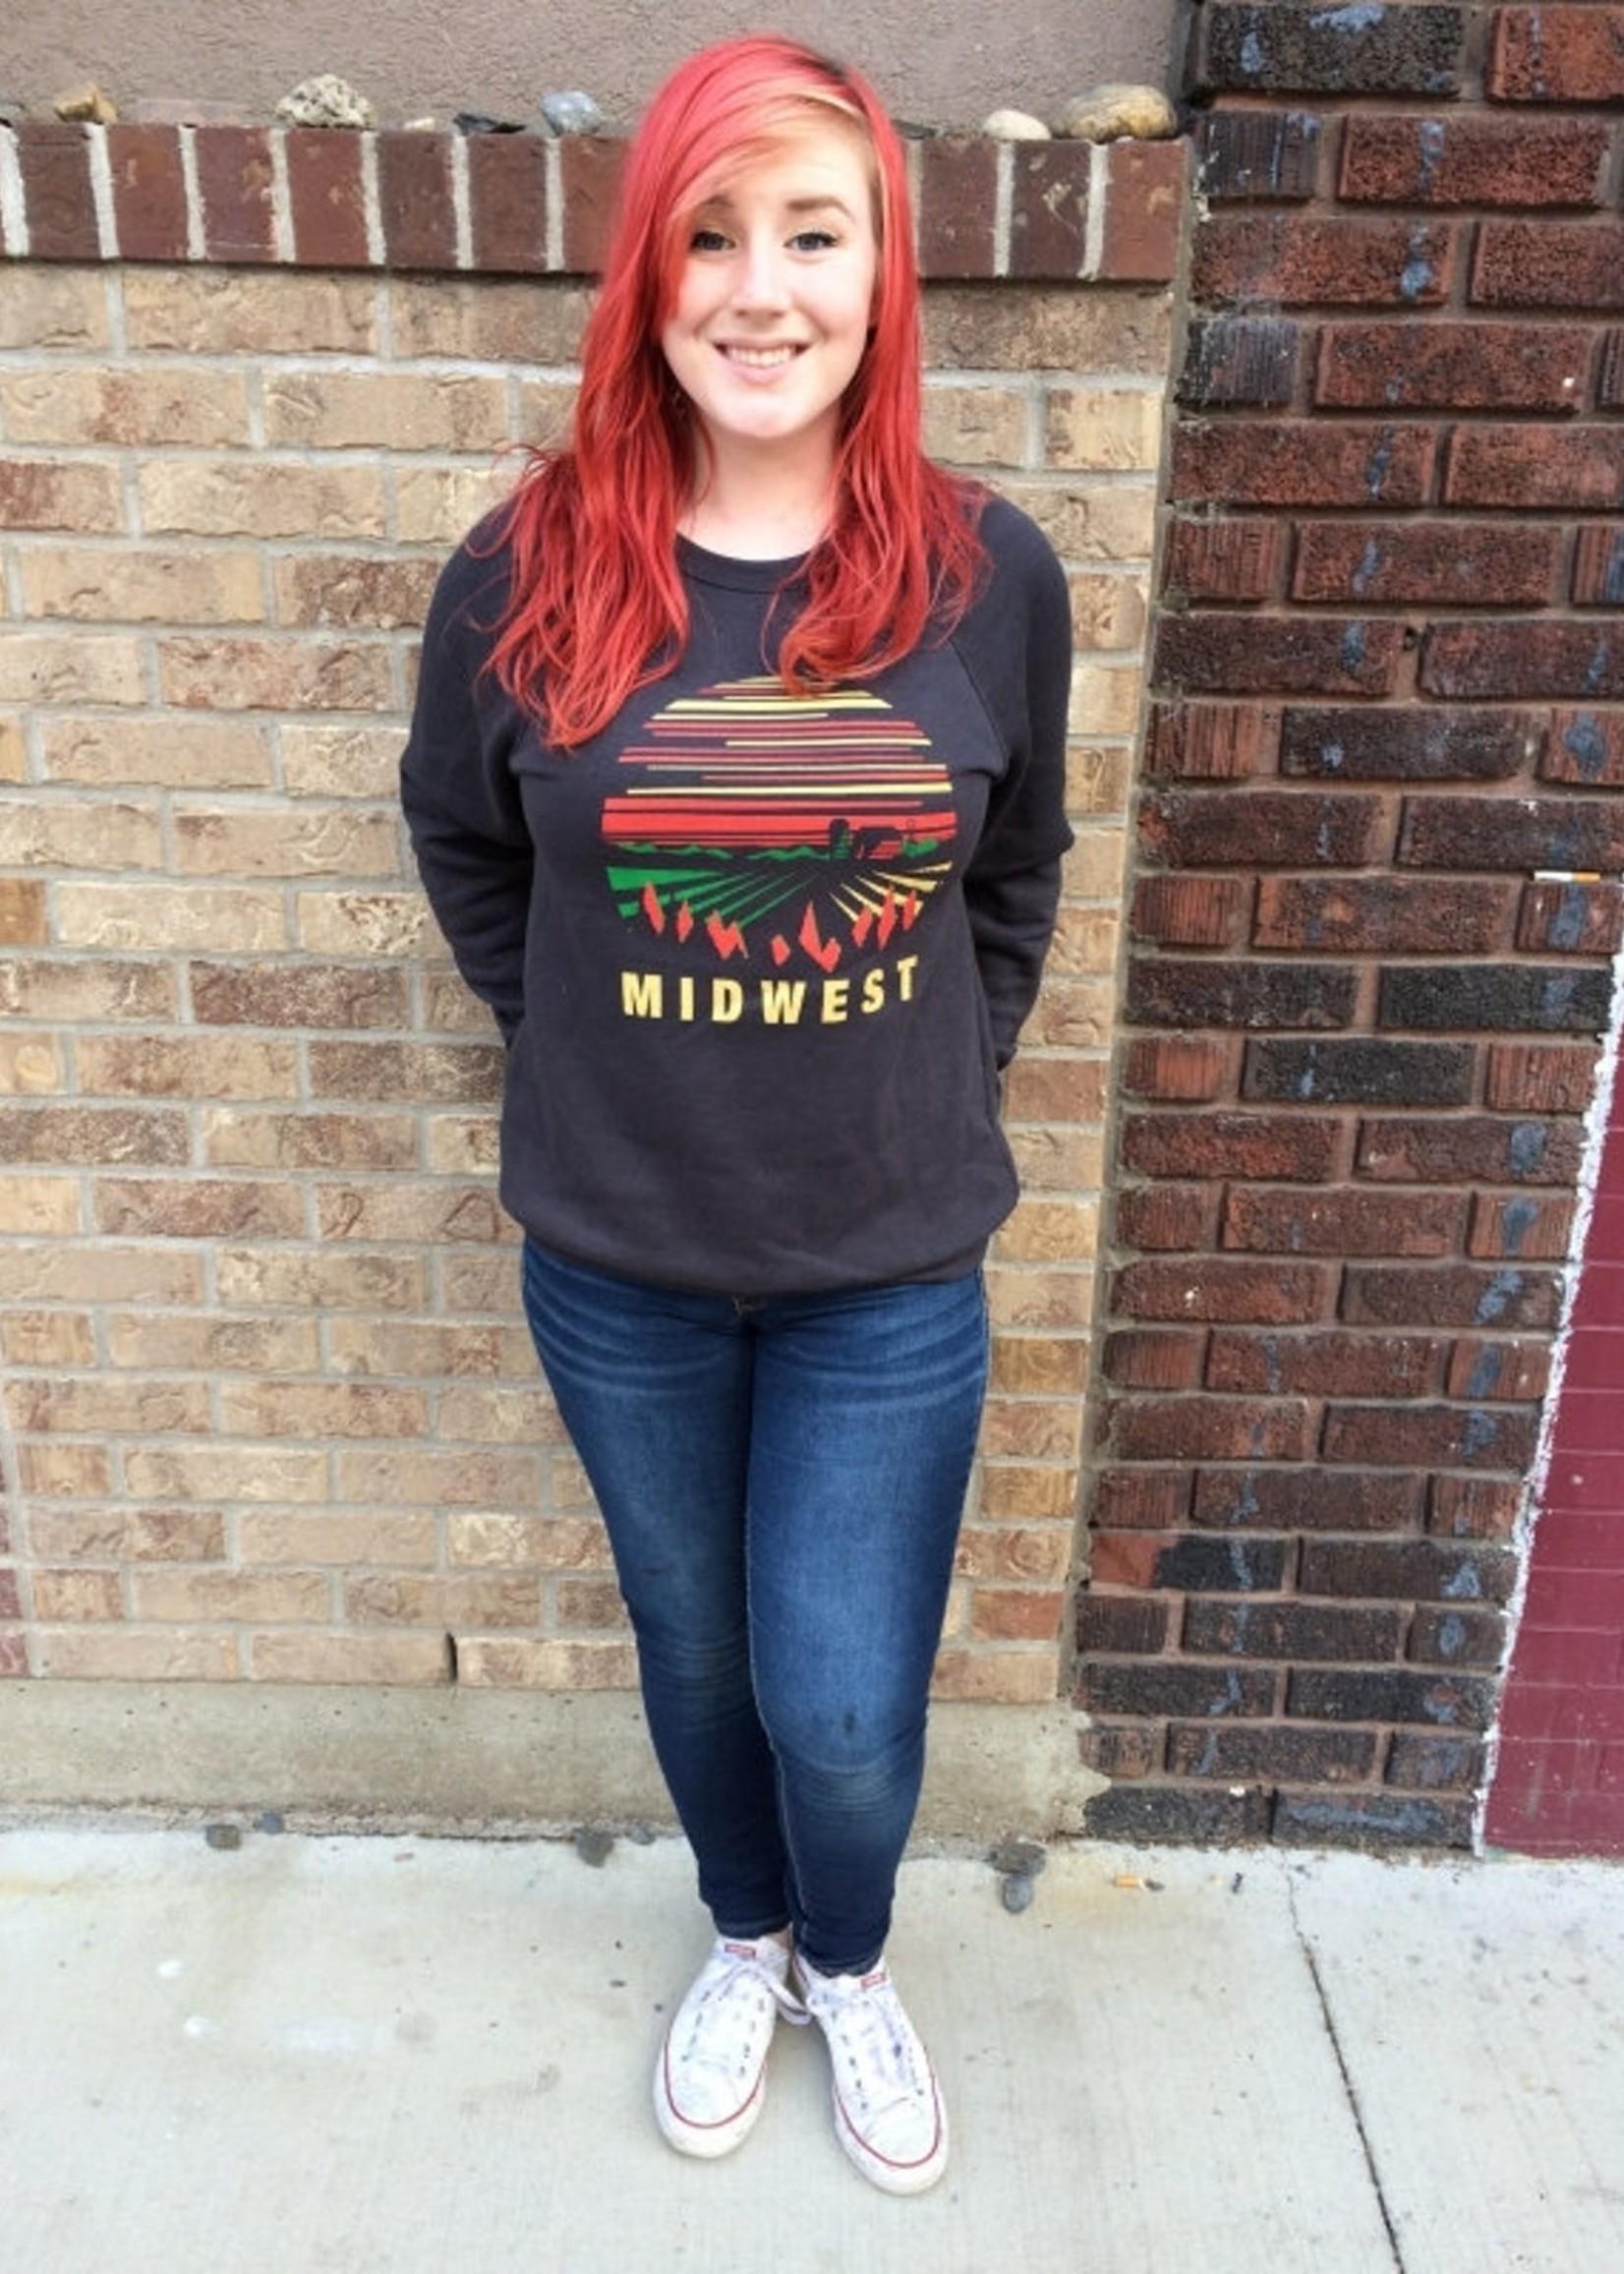 Midwest Adult Crew Neck Sweatshirt